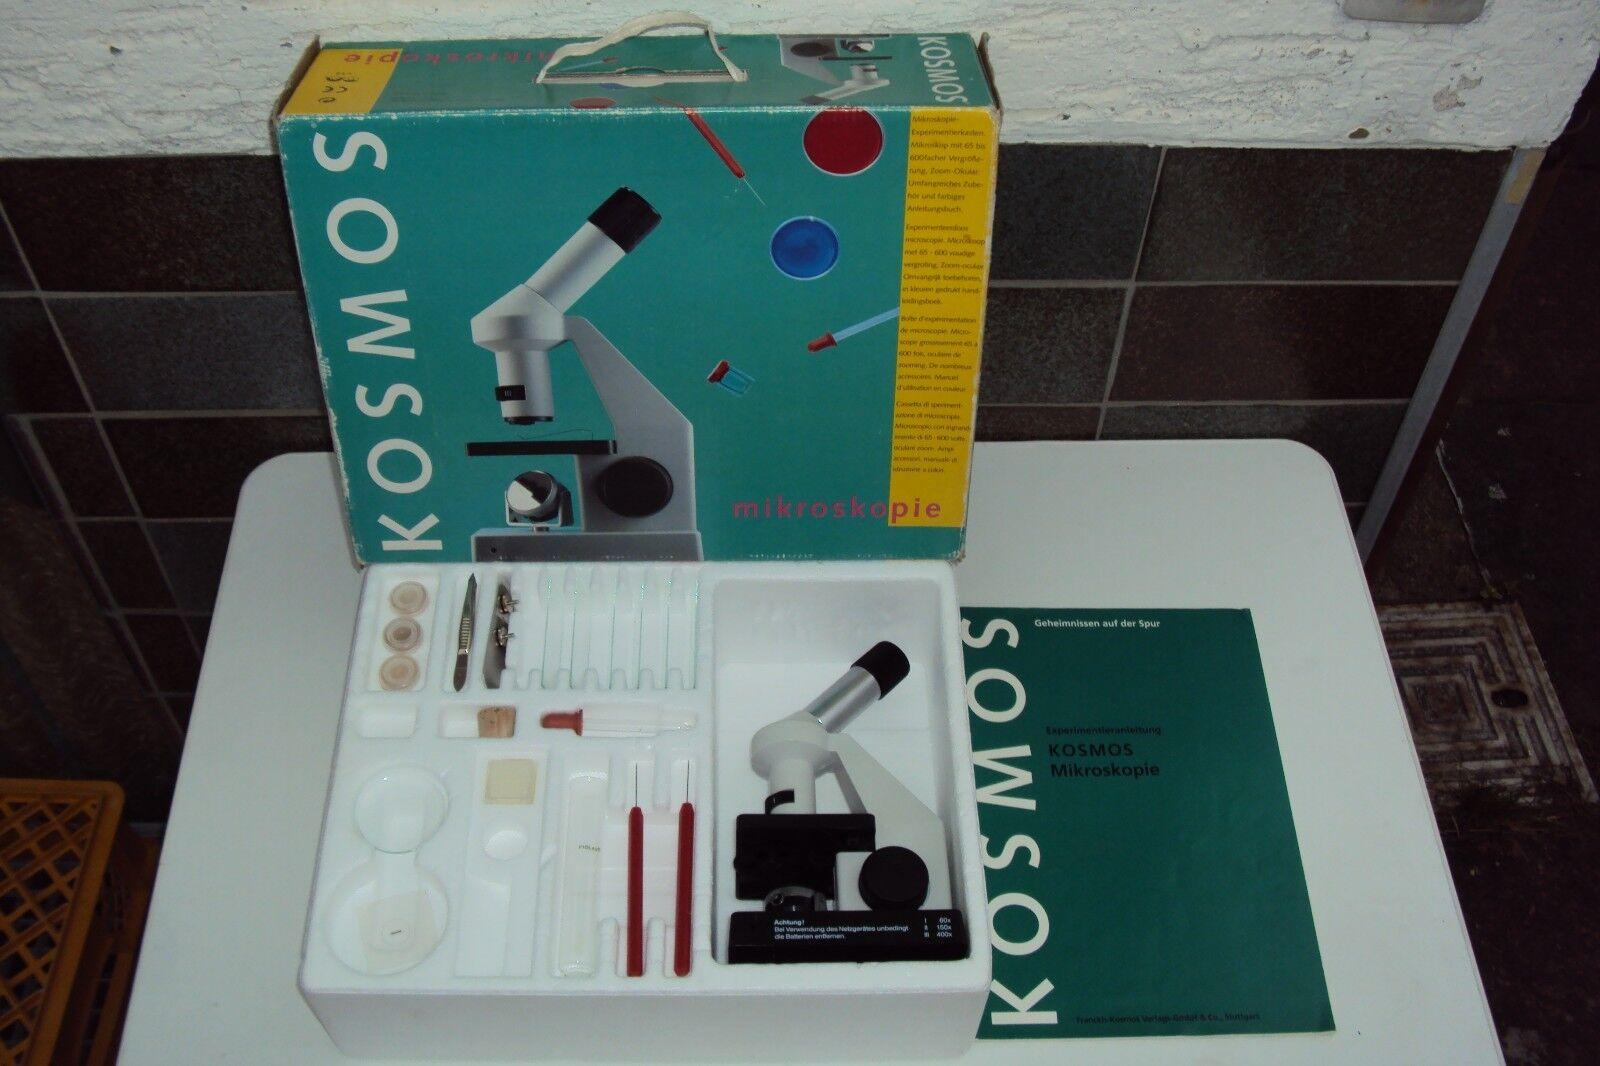 Kosmos mikroskop mikroskopie mikroskop kosmos experimentierkasten